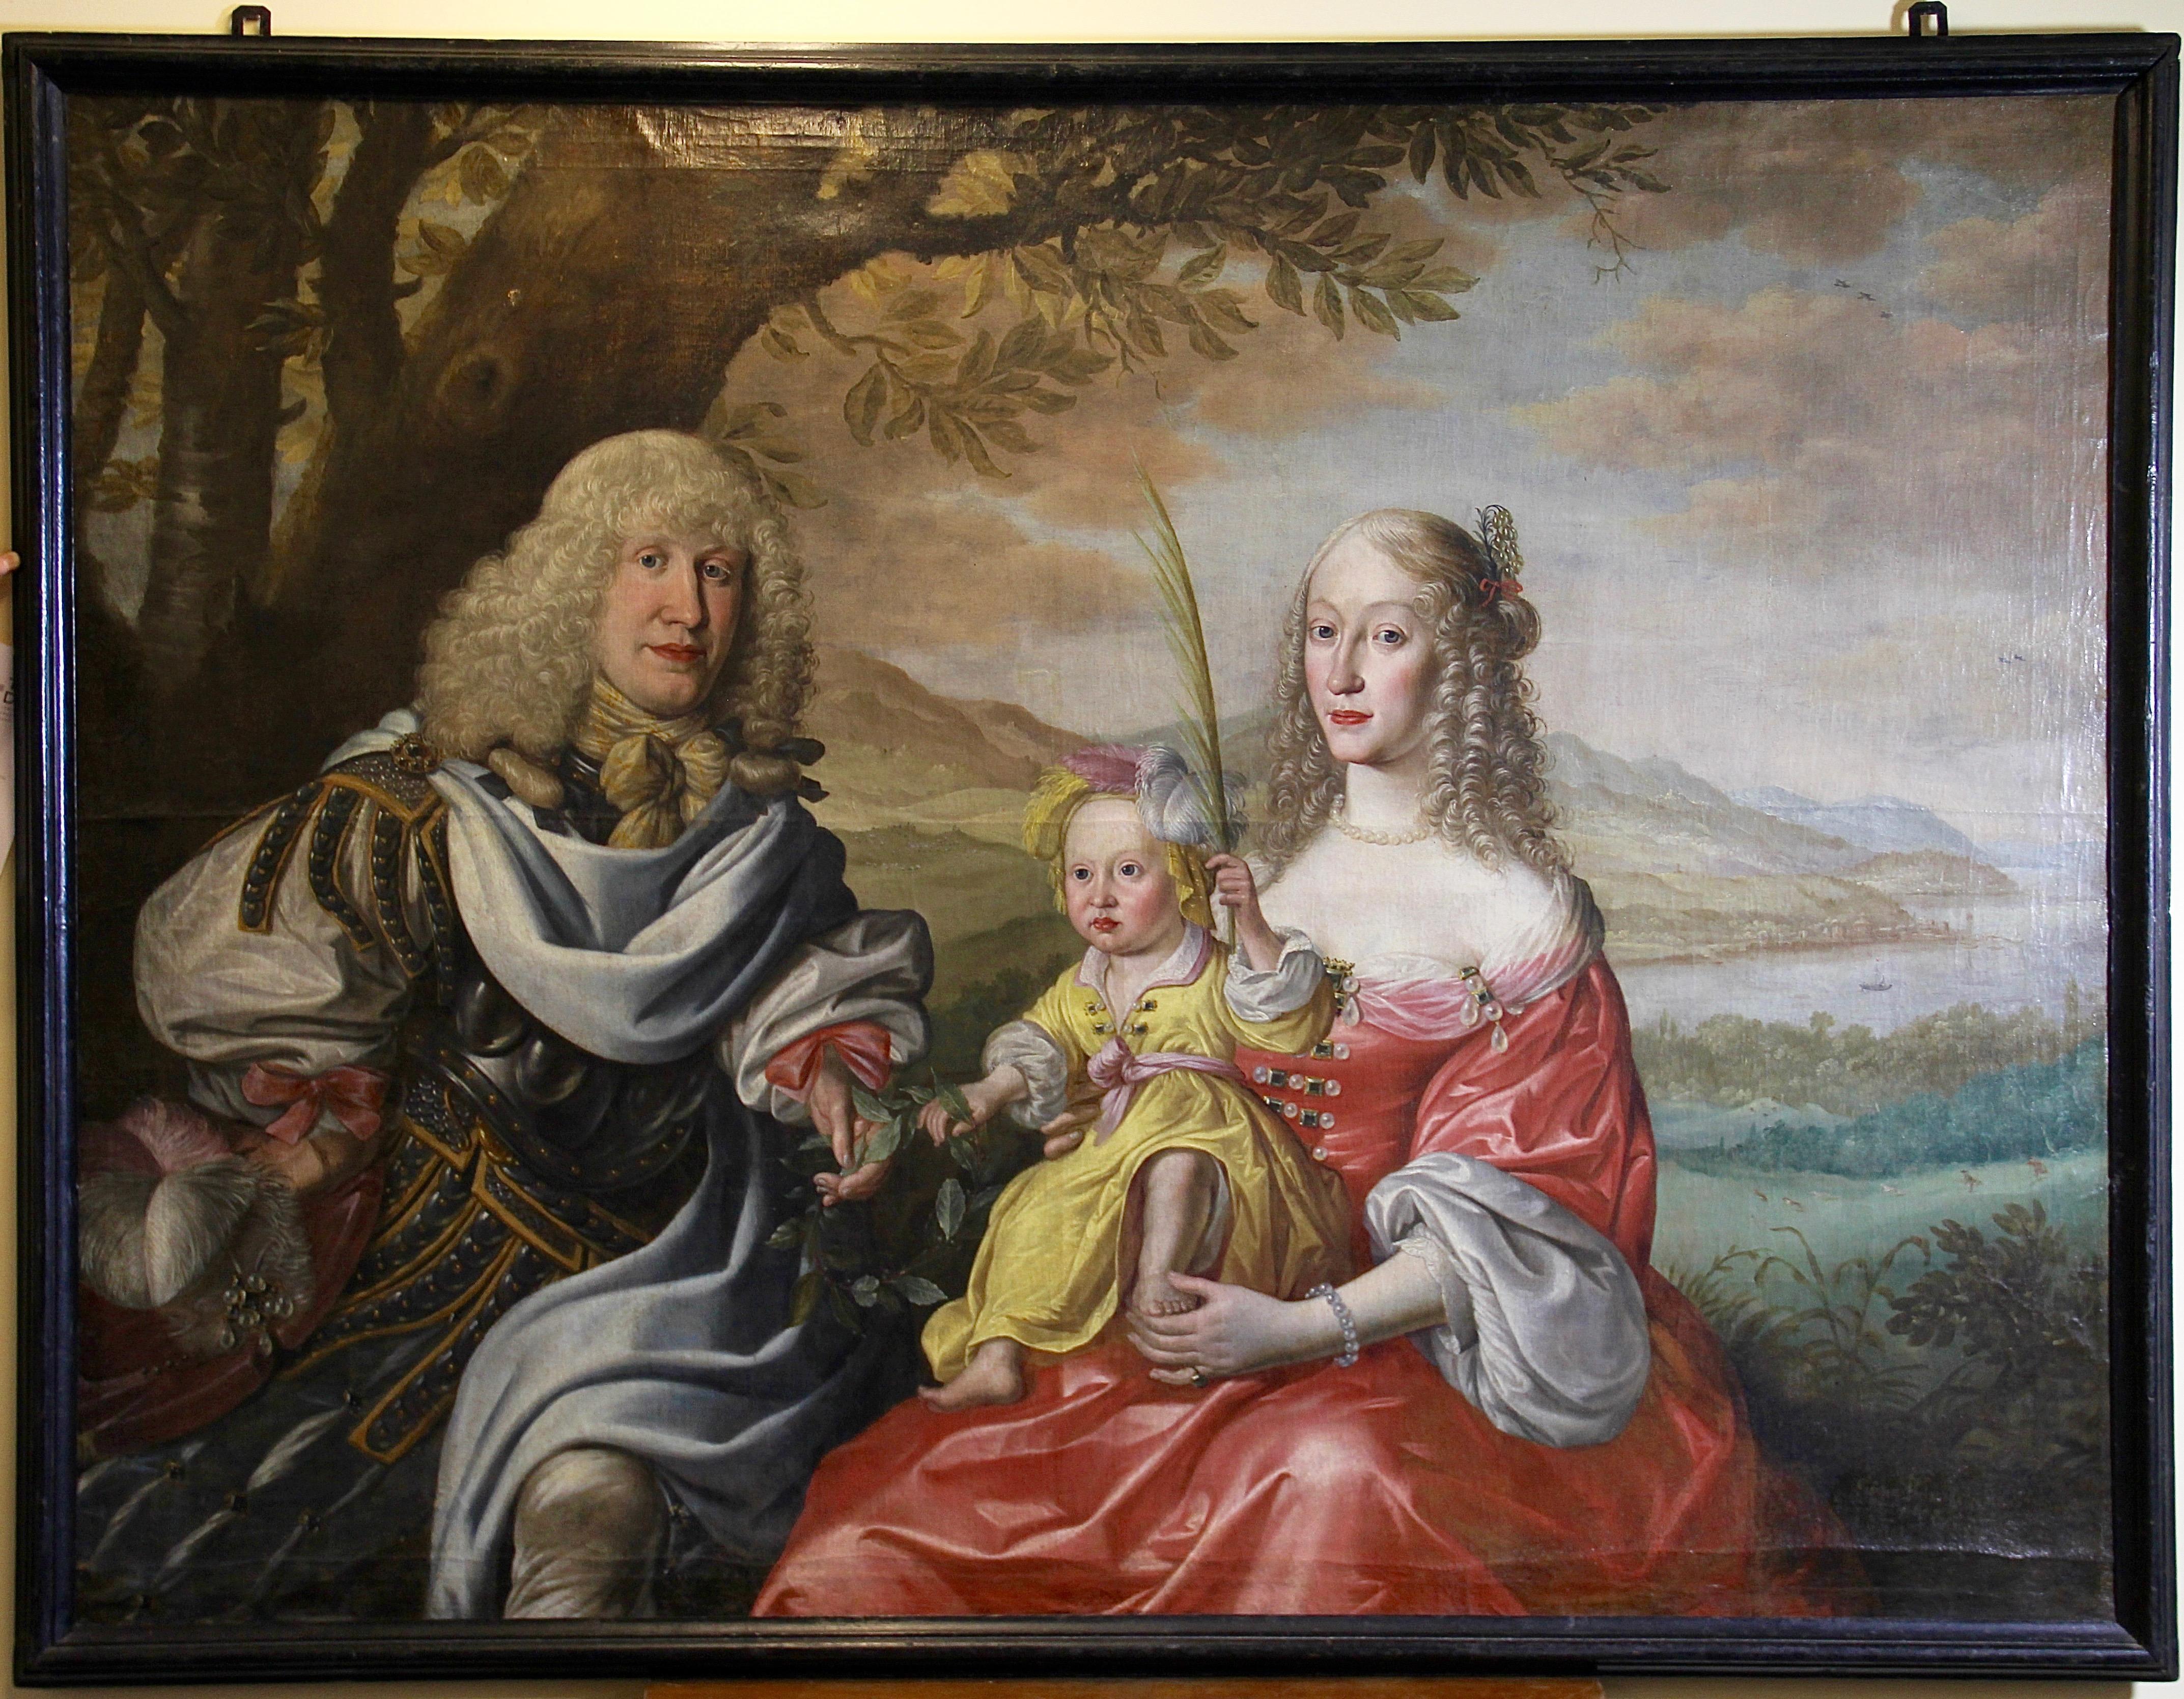 Simon Peter Tilemann Family Portrait 1658 Old Master Baroque Rococo Painting